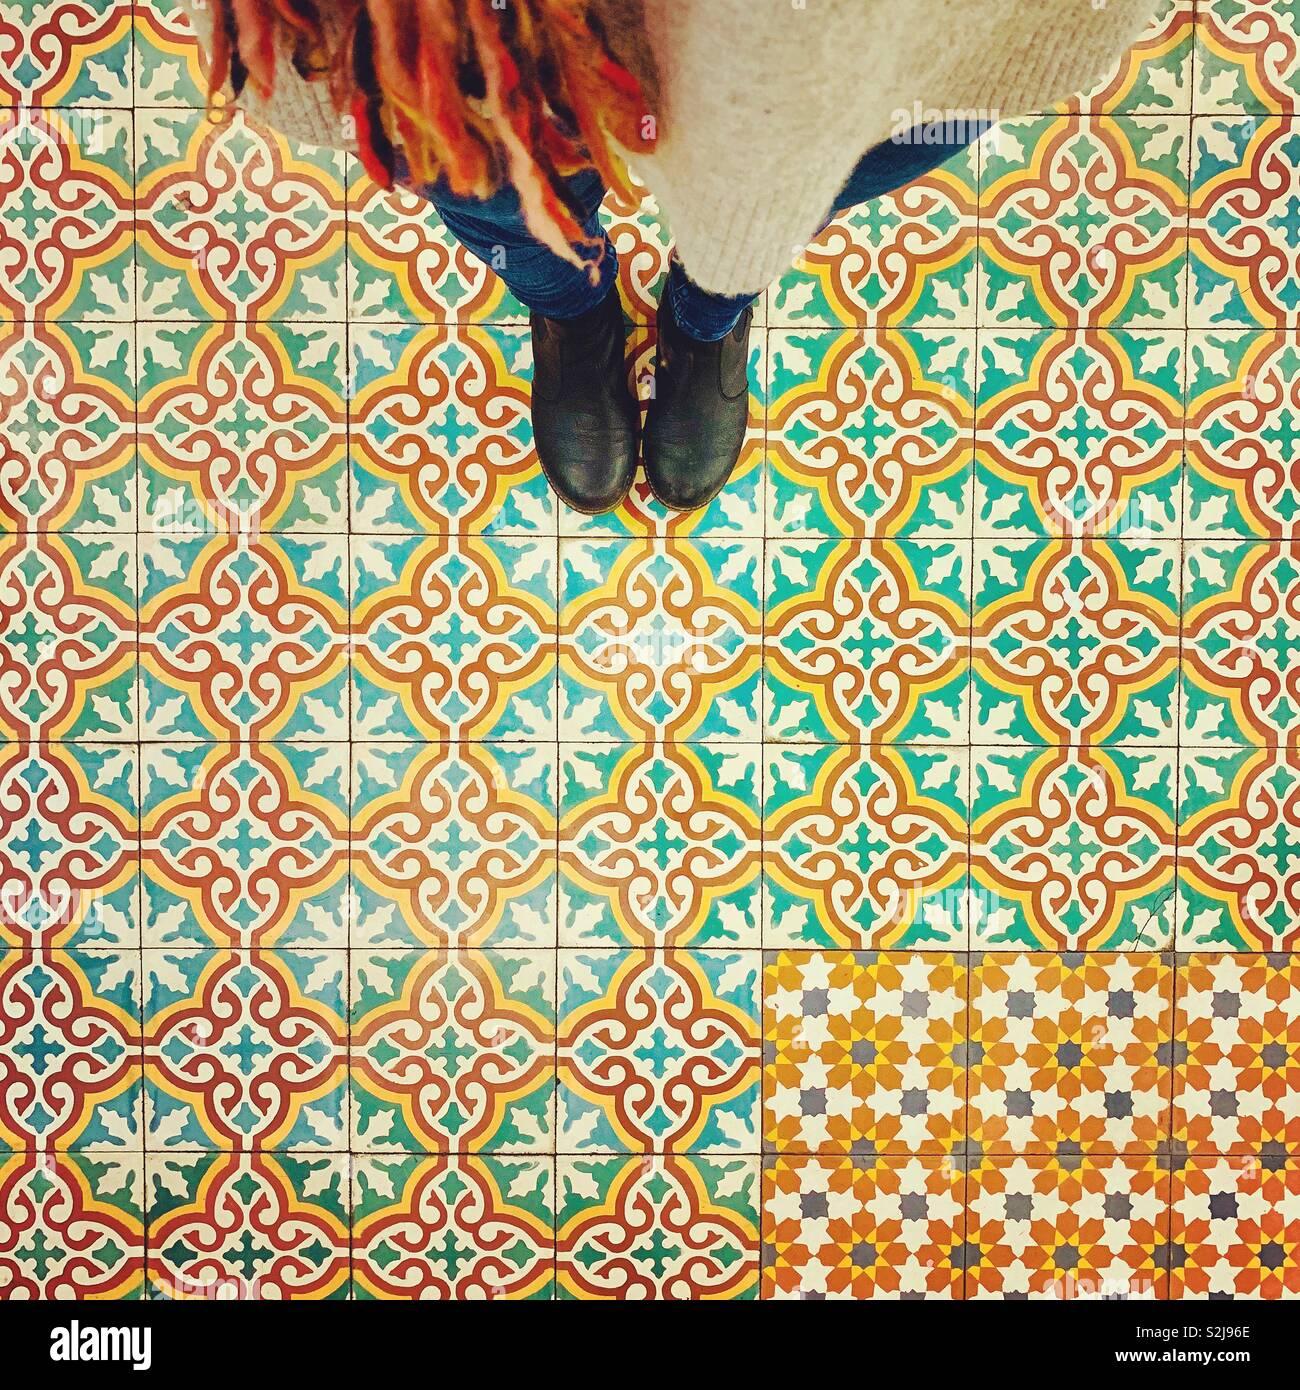 Comptoir en carreaux de sol libanais Photo Stock